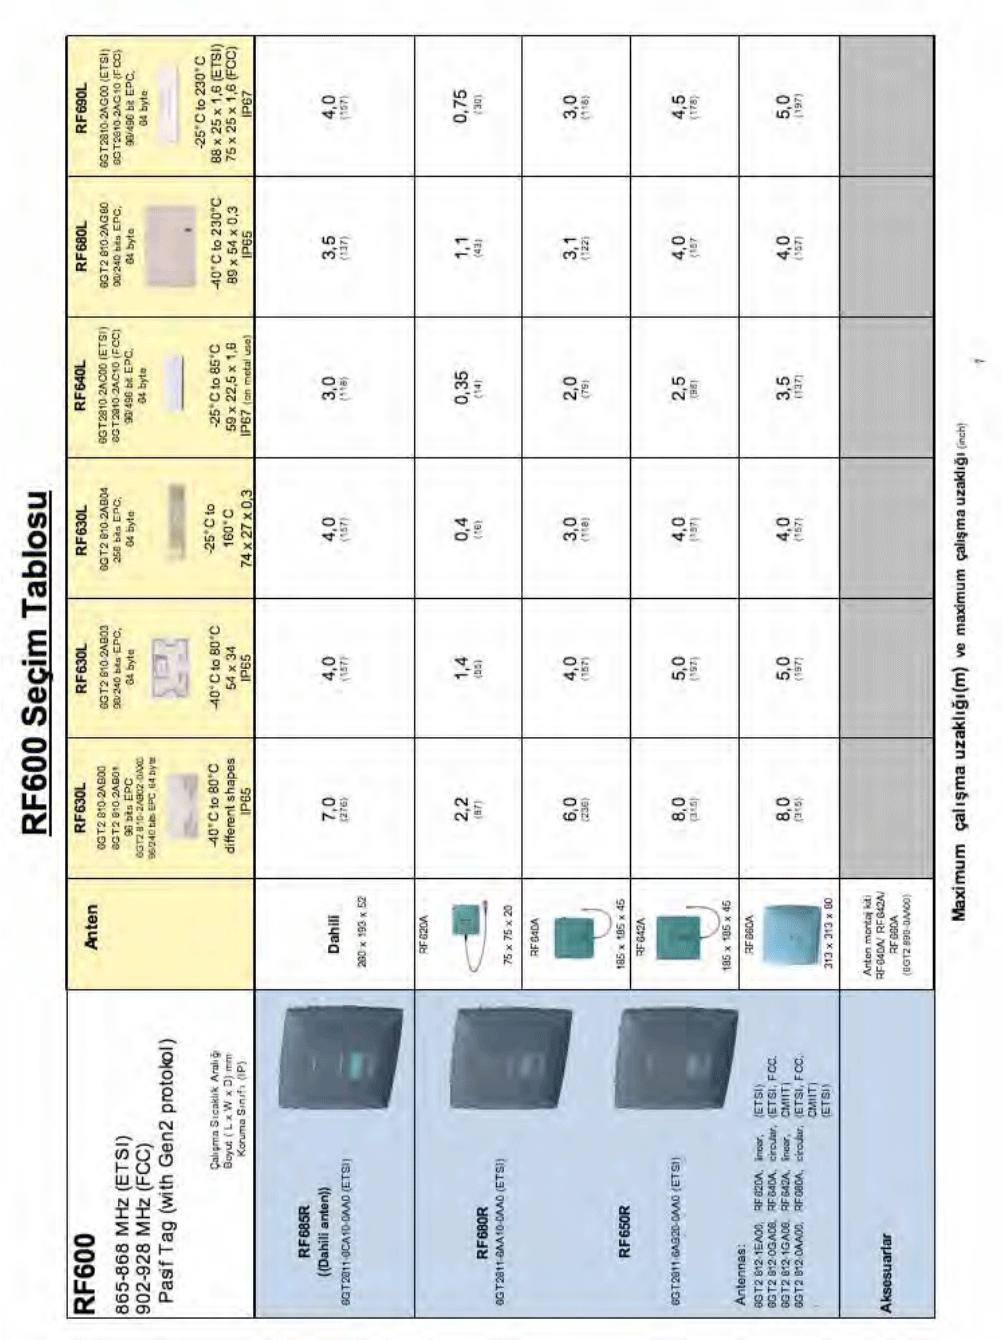 Endstriyel Otomasyon Ve Src Teknolojileri Wiring Diagram For 3 Speed Fan Motor Fx2 75x 59